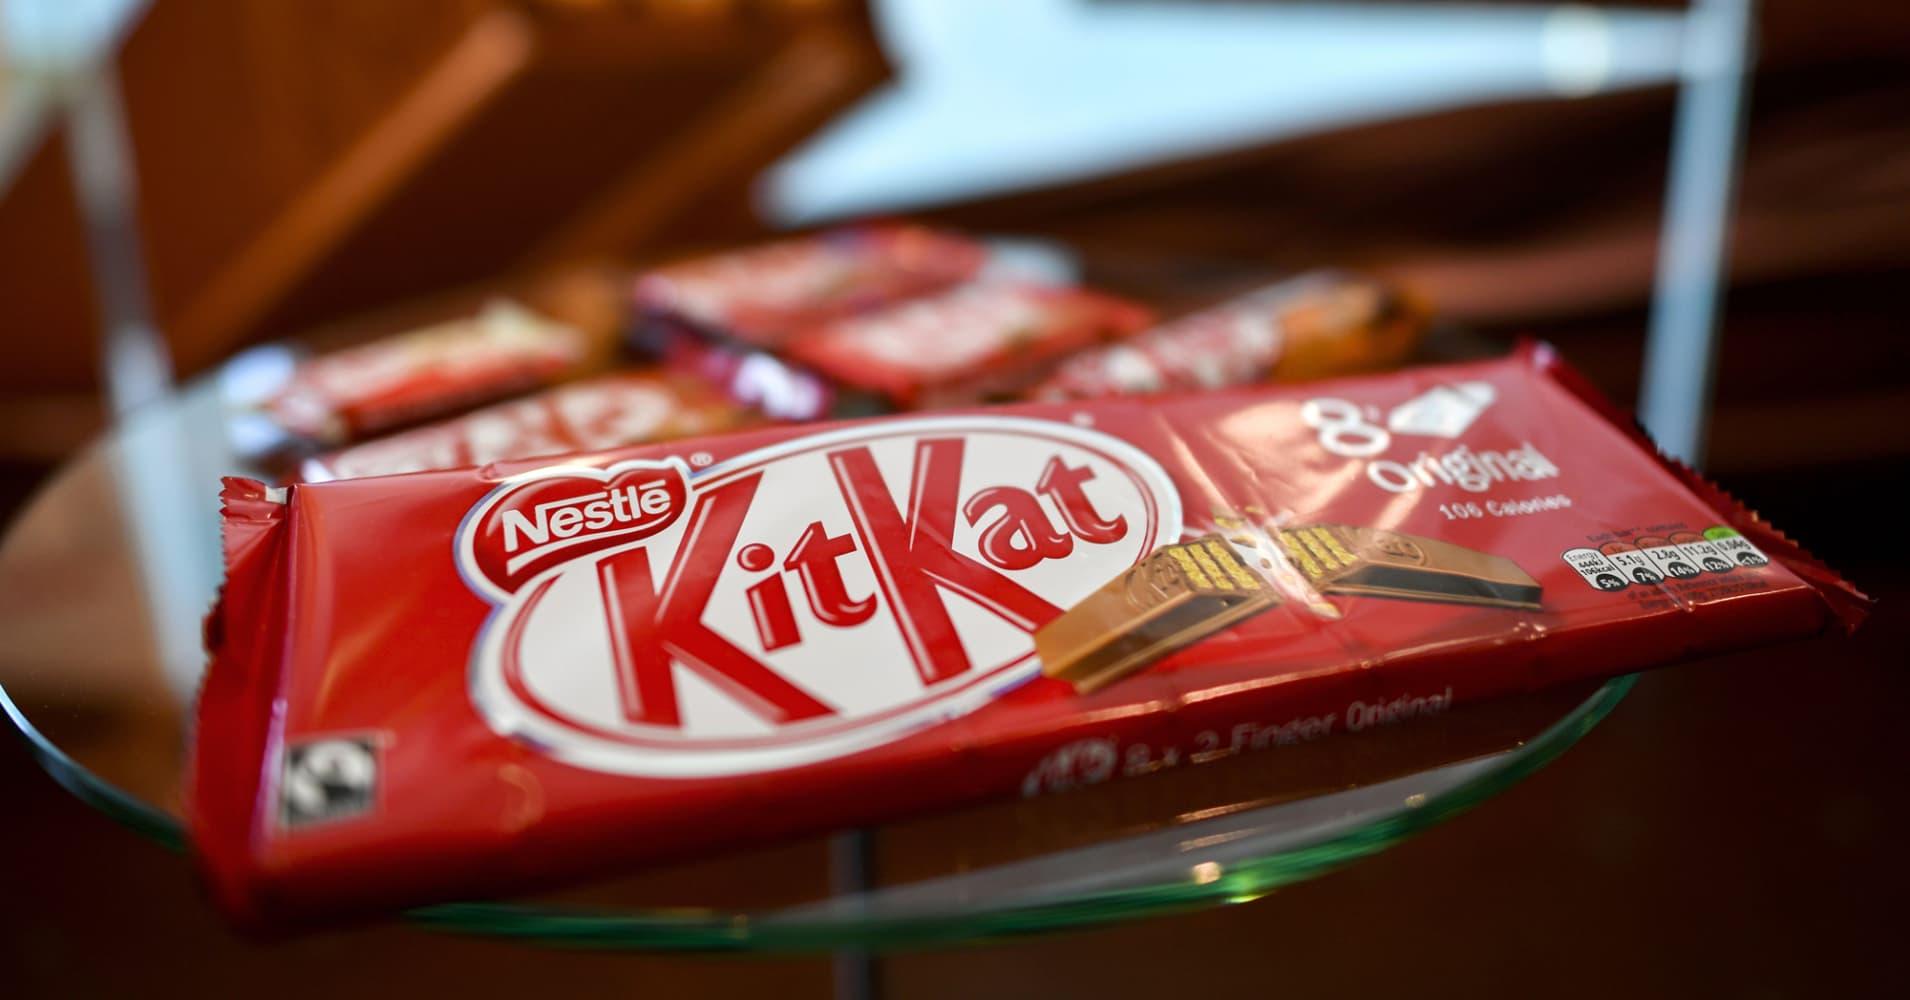 Nestle plans $20.8 billion share buyback after Third Point pressure